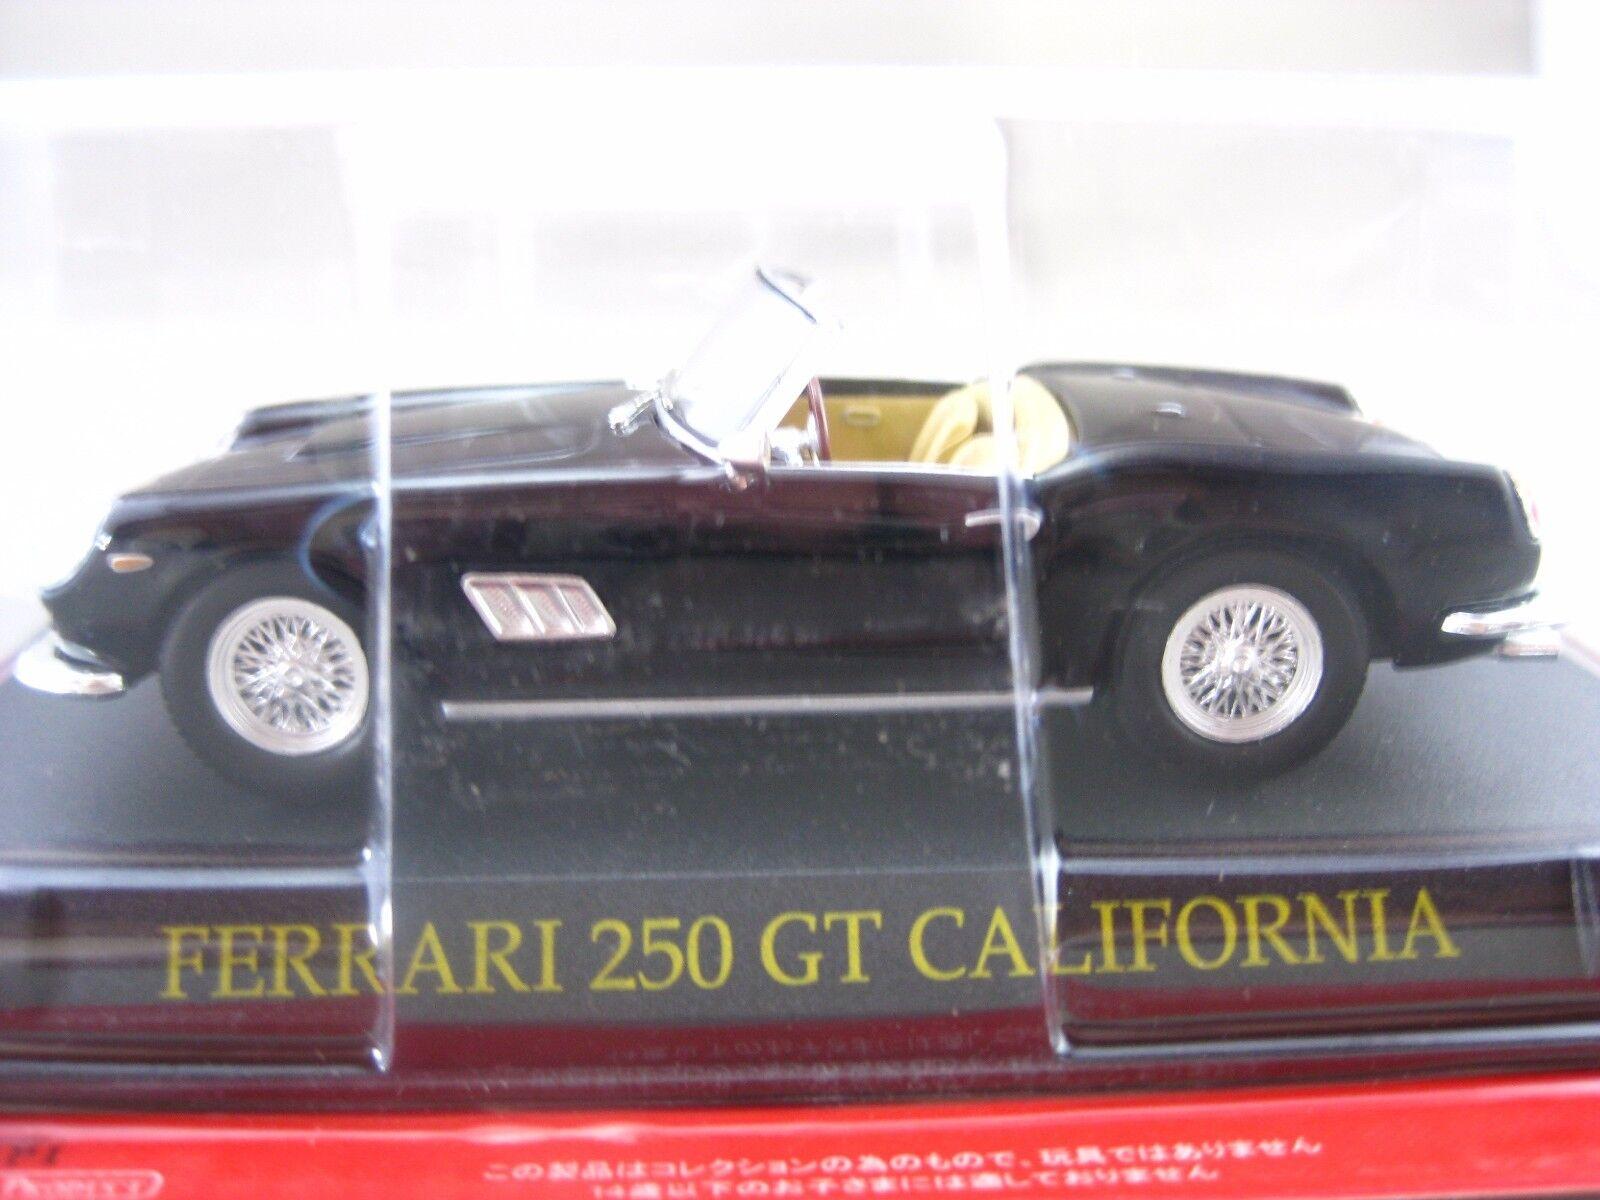 Ferrari 250 GT California Hachette 1 43 Diecast Car Vol.22